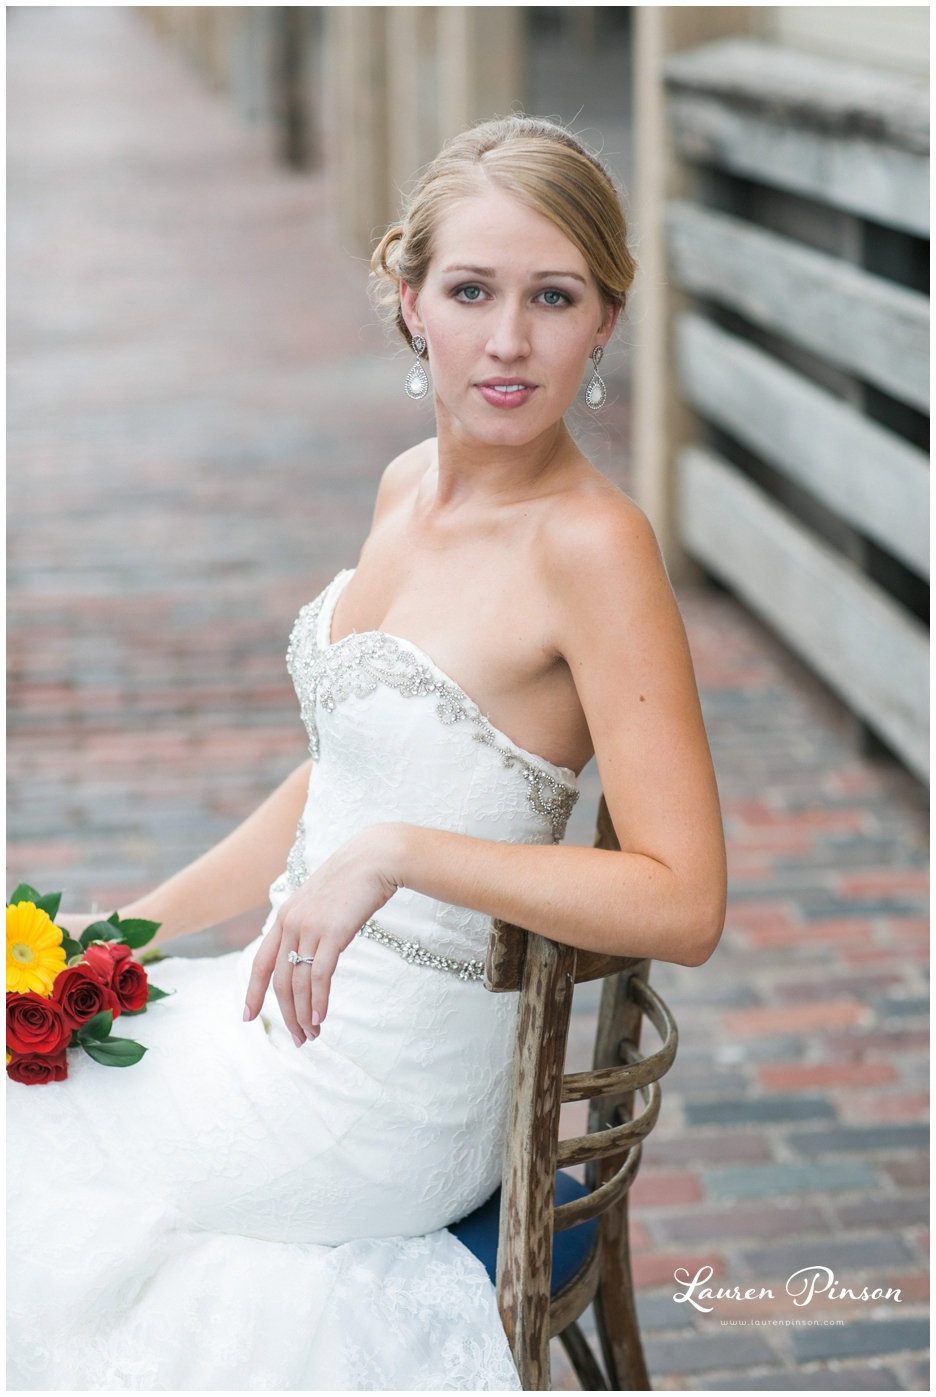 fort-worth-bridal-session-at-the-stockyards-fort-worth-wedding-photographer-wichita-falls-wedding-photographer_1327.jpg